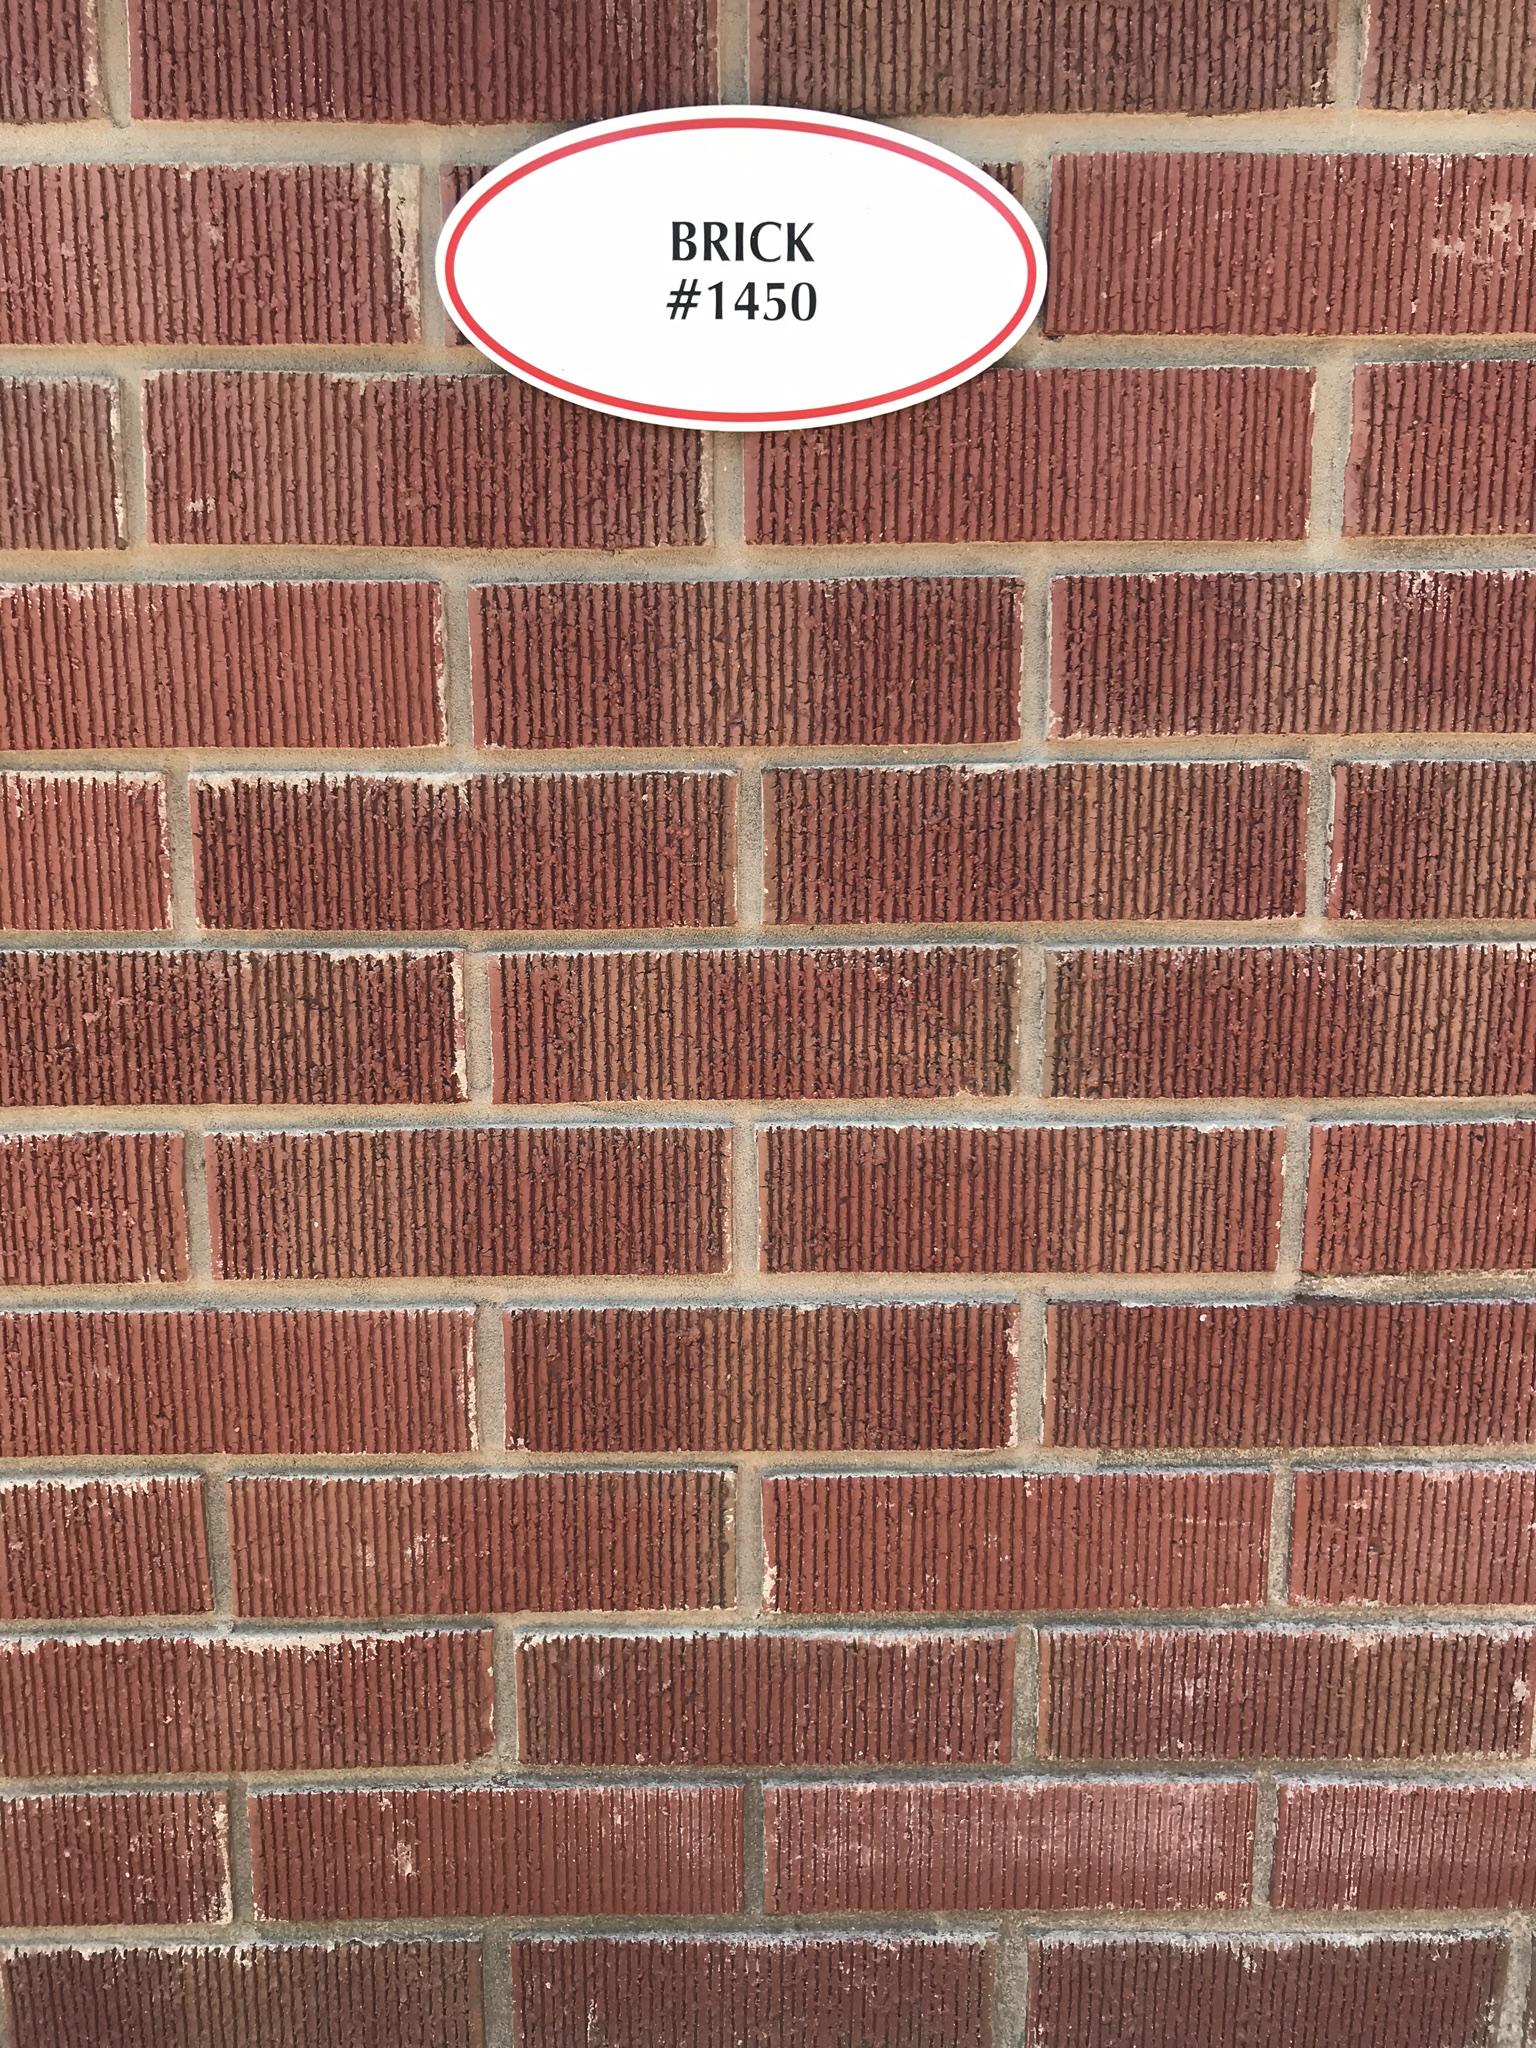 Brick #1450